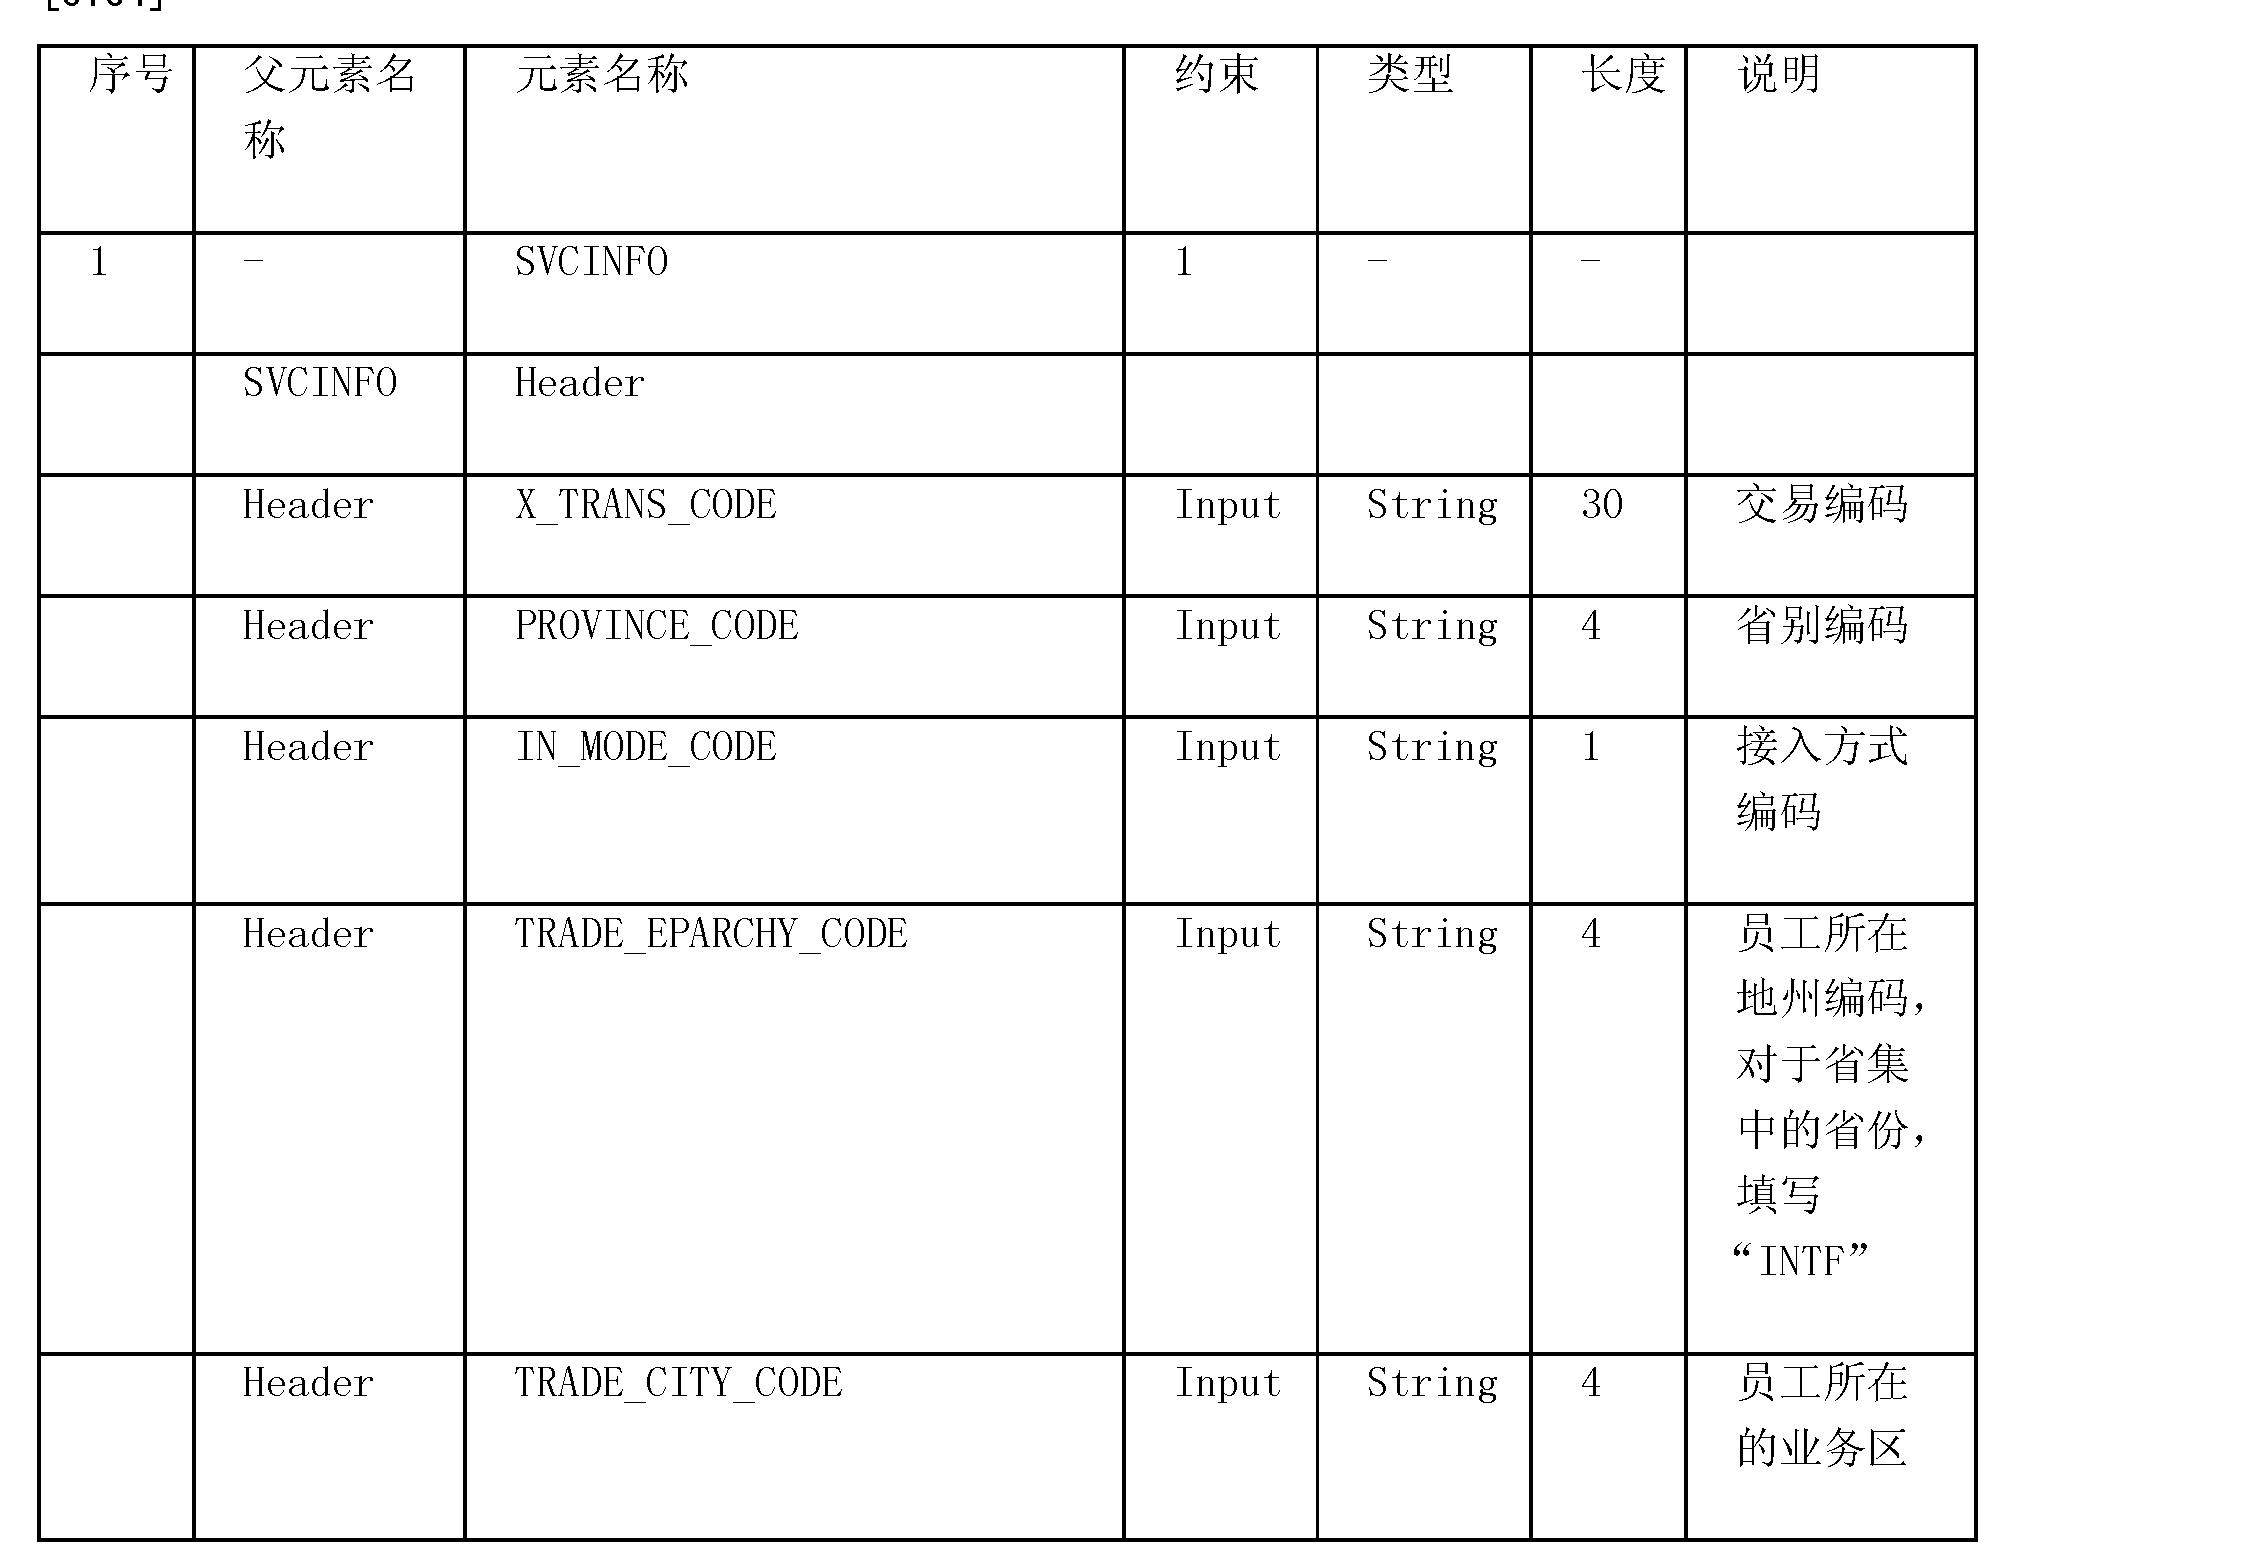 CN101854348B - Realization method of SOA (Service Oriented